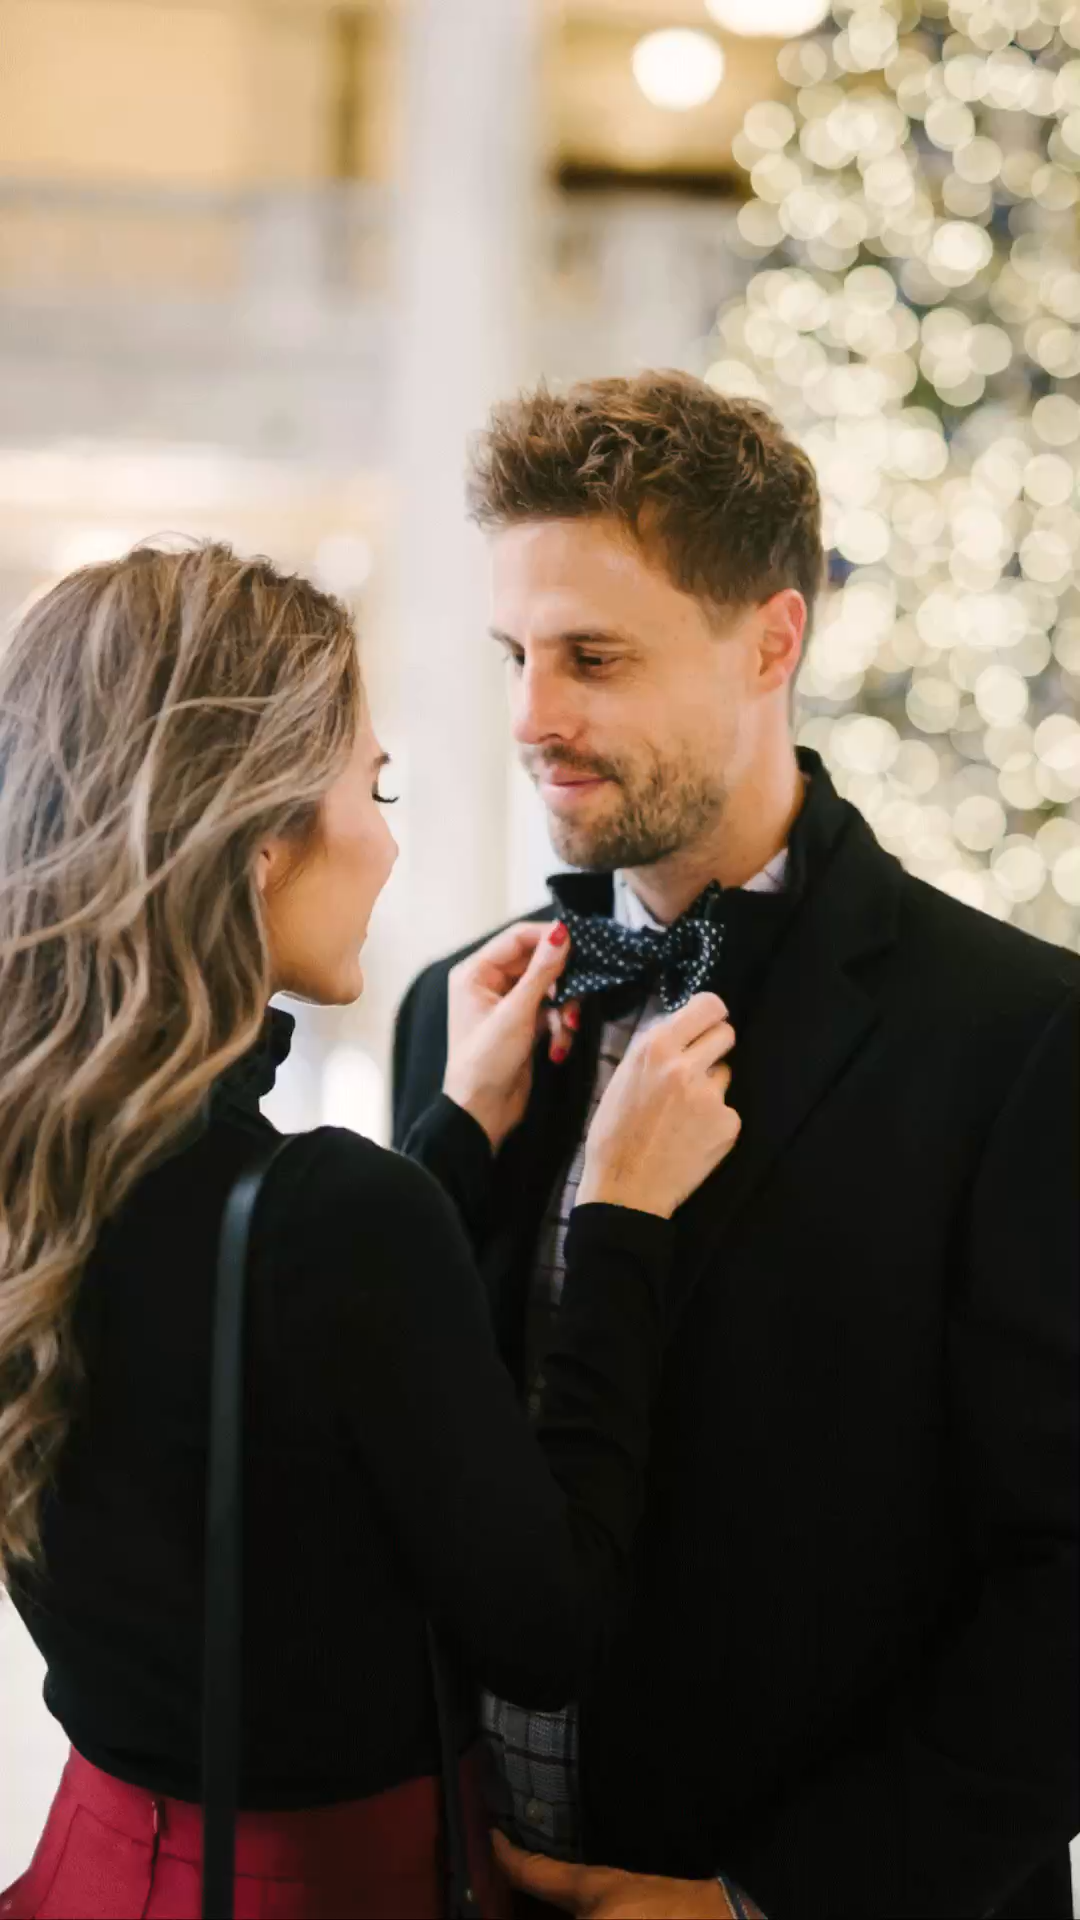 Couple's Christmas Shoot -   17 christmas photoshoot couples outfits ideas